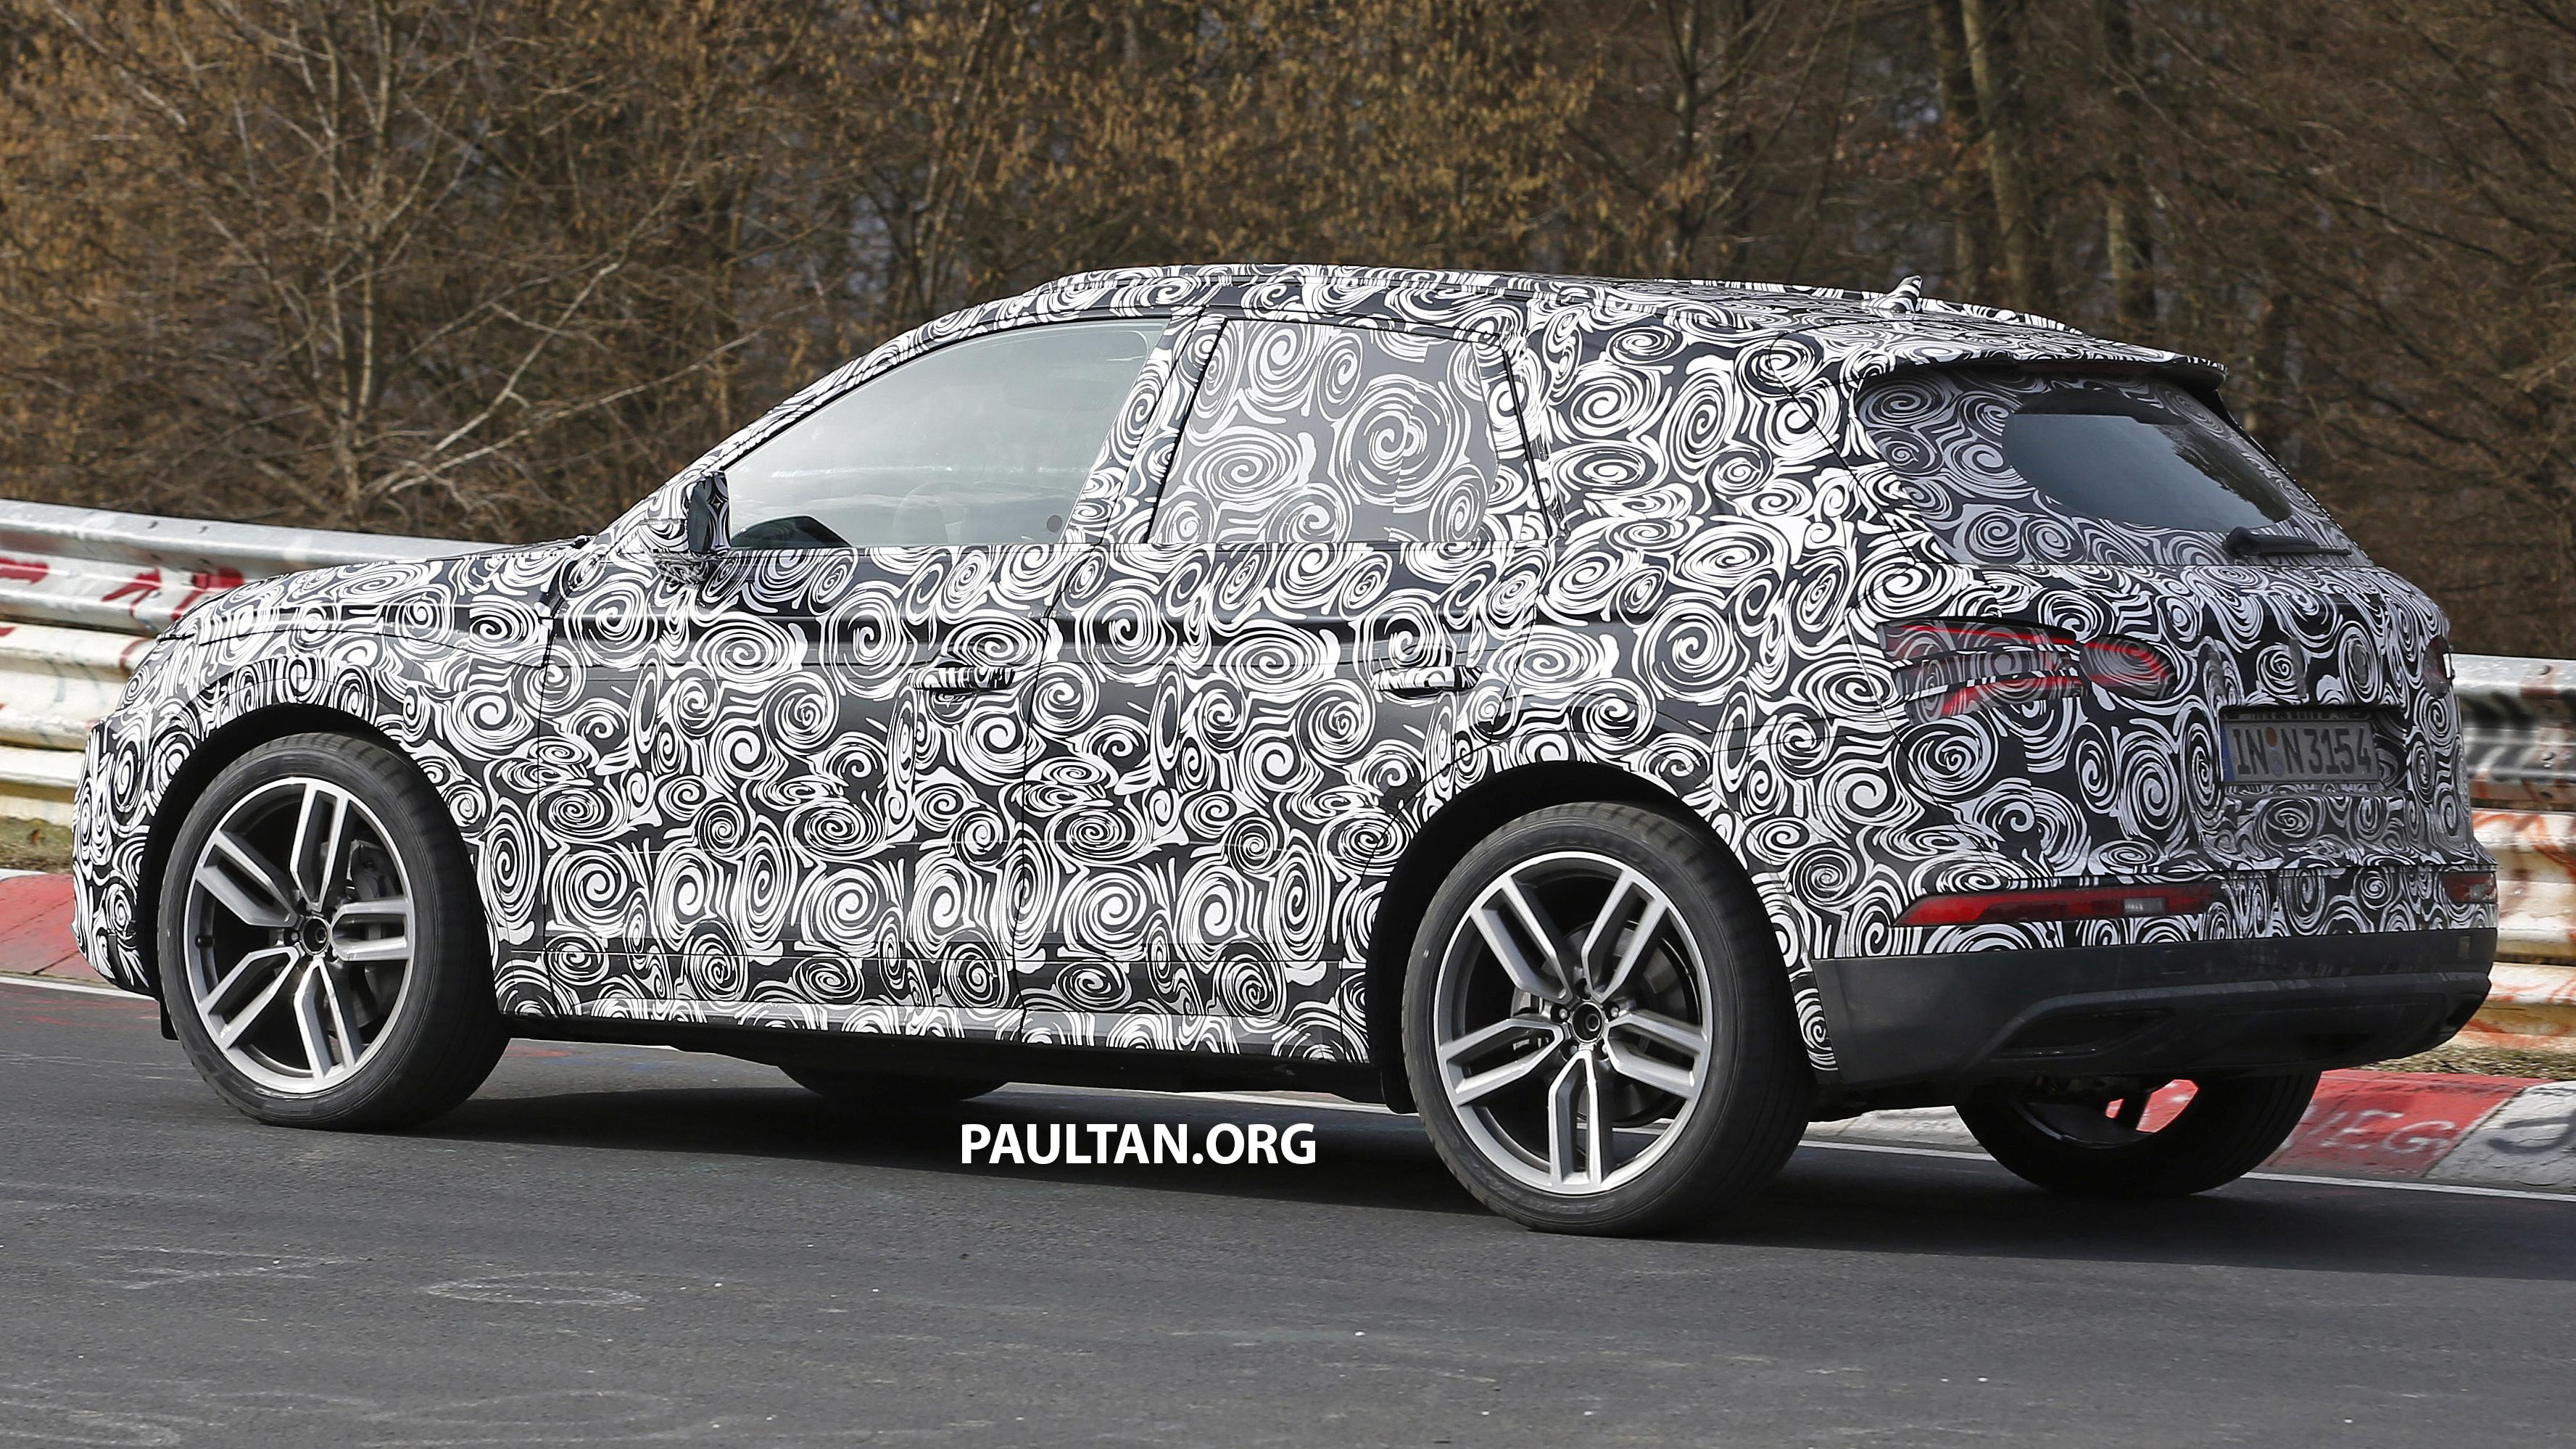 2016 Audi Q5 >> SPYSHOTS: 2017 Audi Q5 peels away some disguise Paul Tan - Image 461488